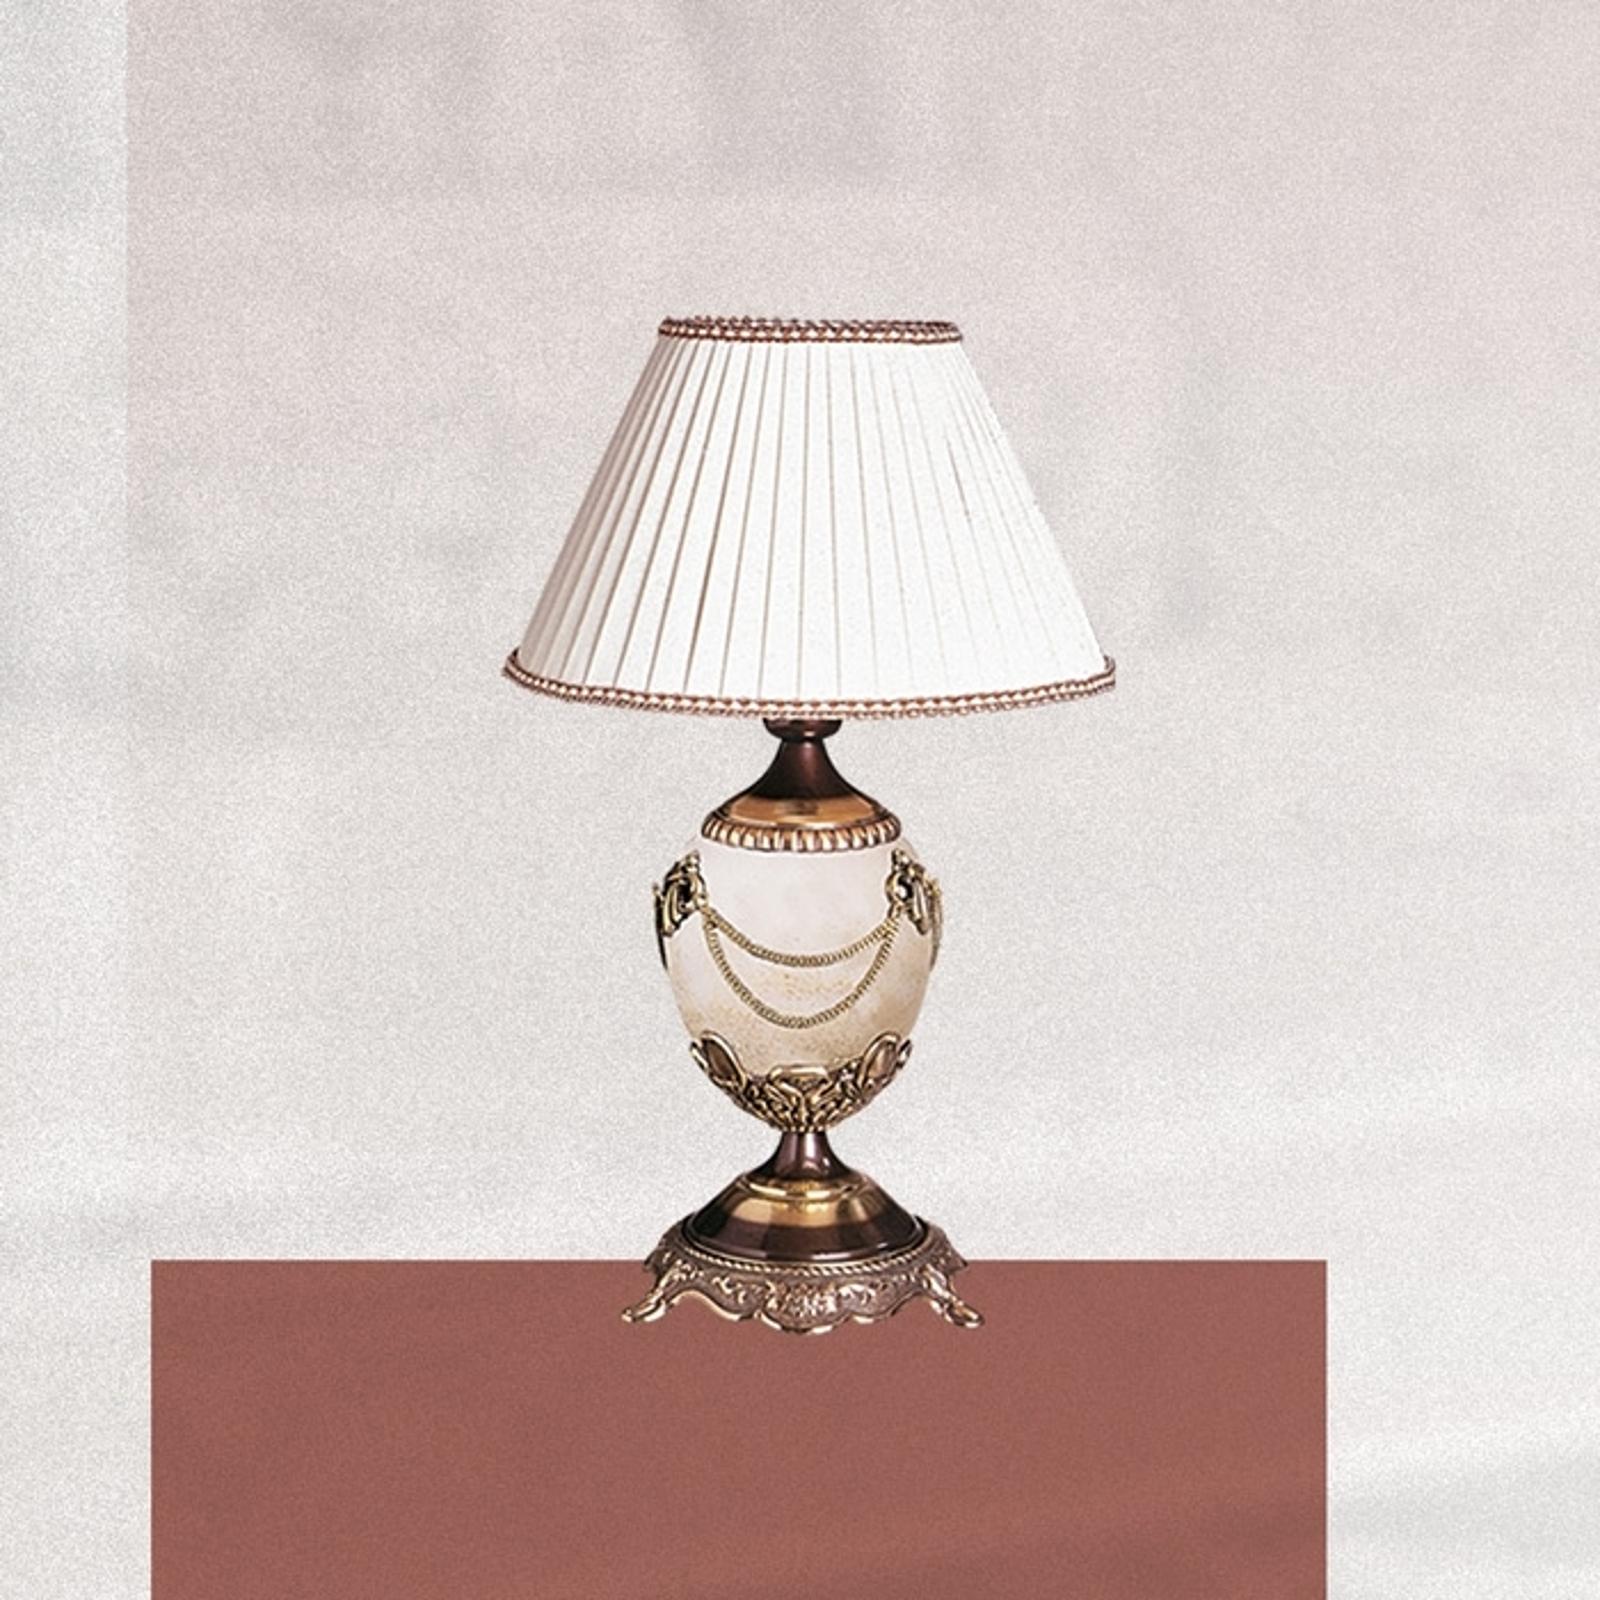 Zeer decoratieve tafellamp PRESTIGE, 47 cm